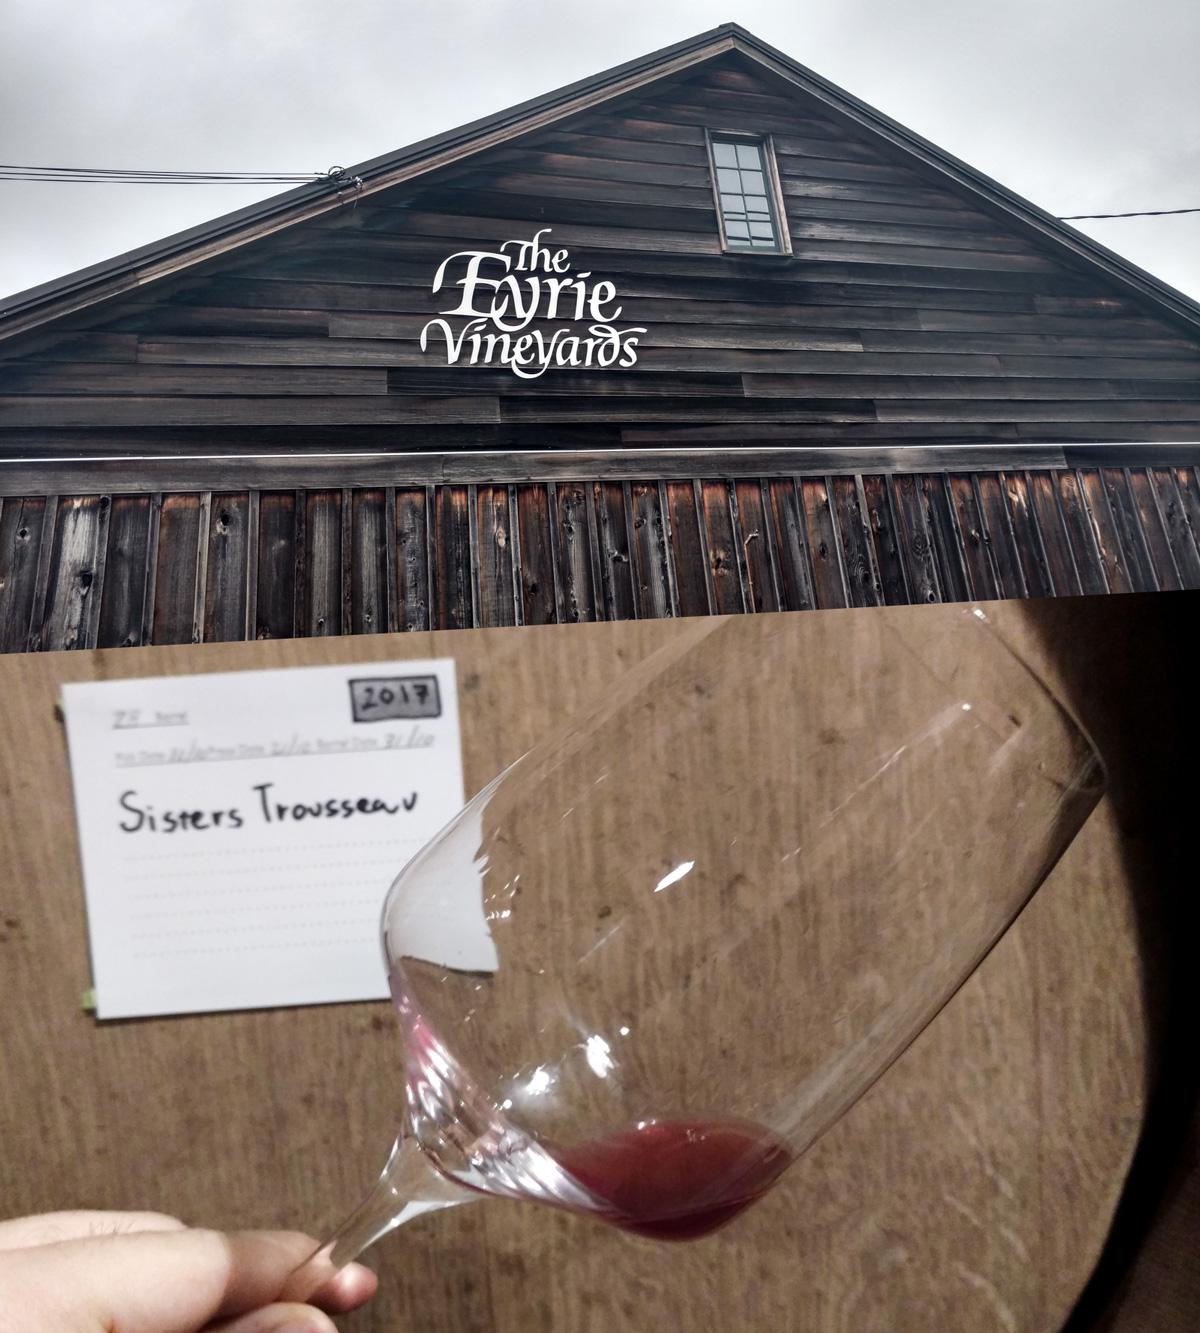 the-eyrie-vineyards-oregon-trousseau